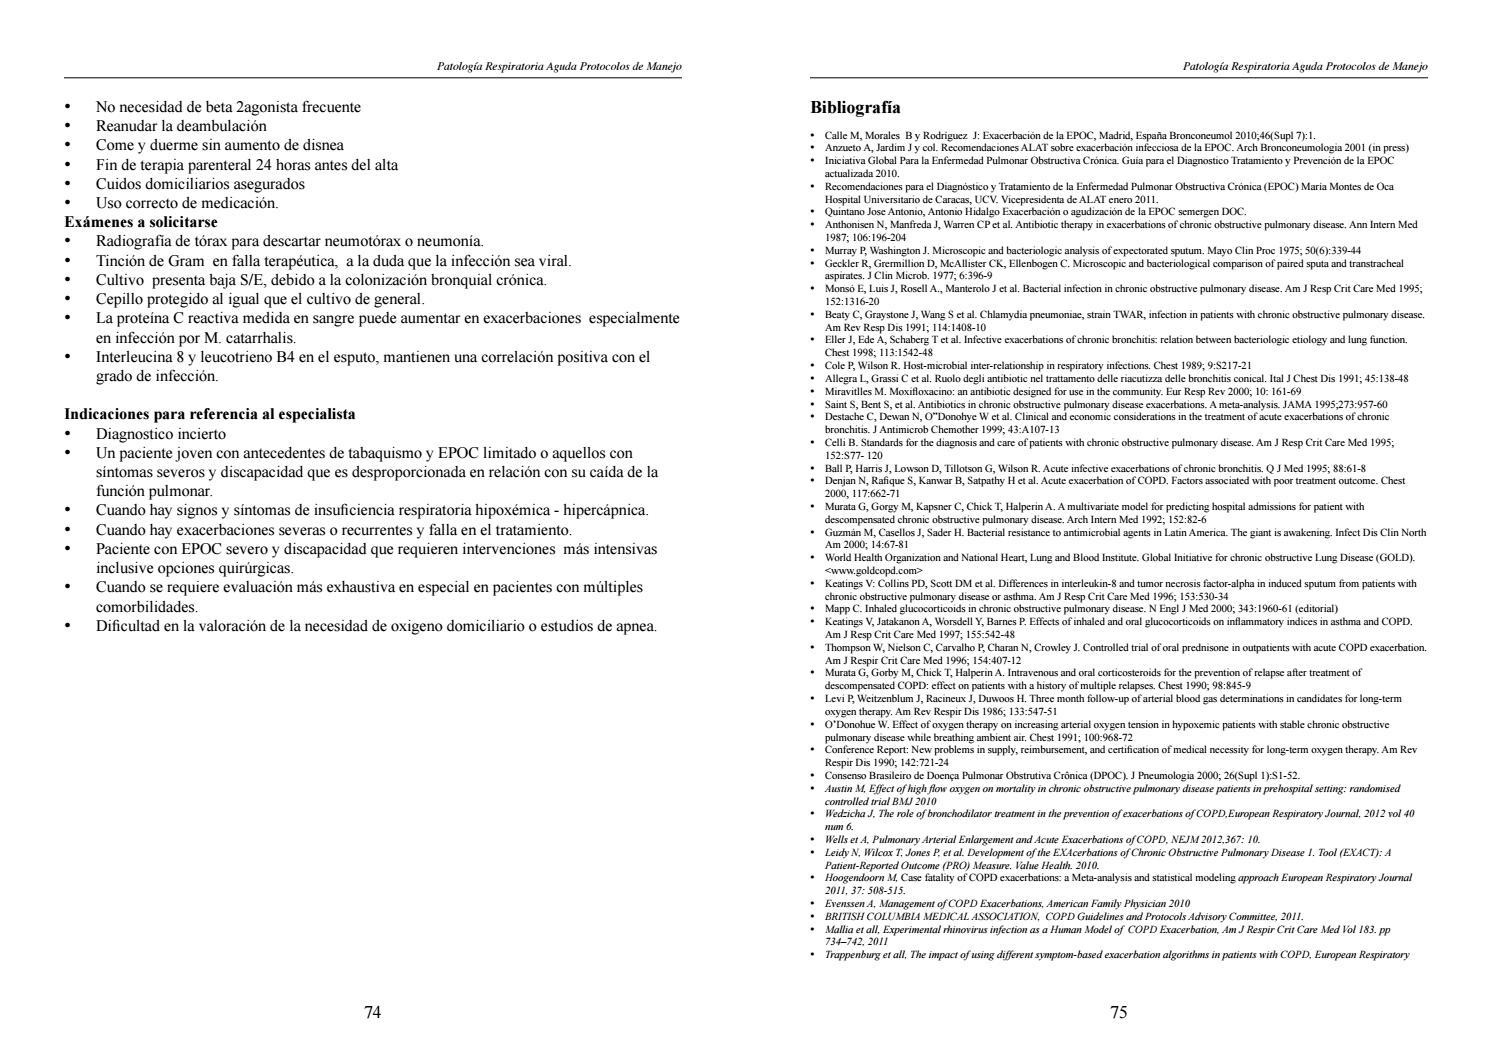 Patologia respiratoria aguda protocolos de manejo by Diego Isra ...